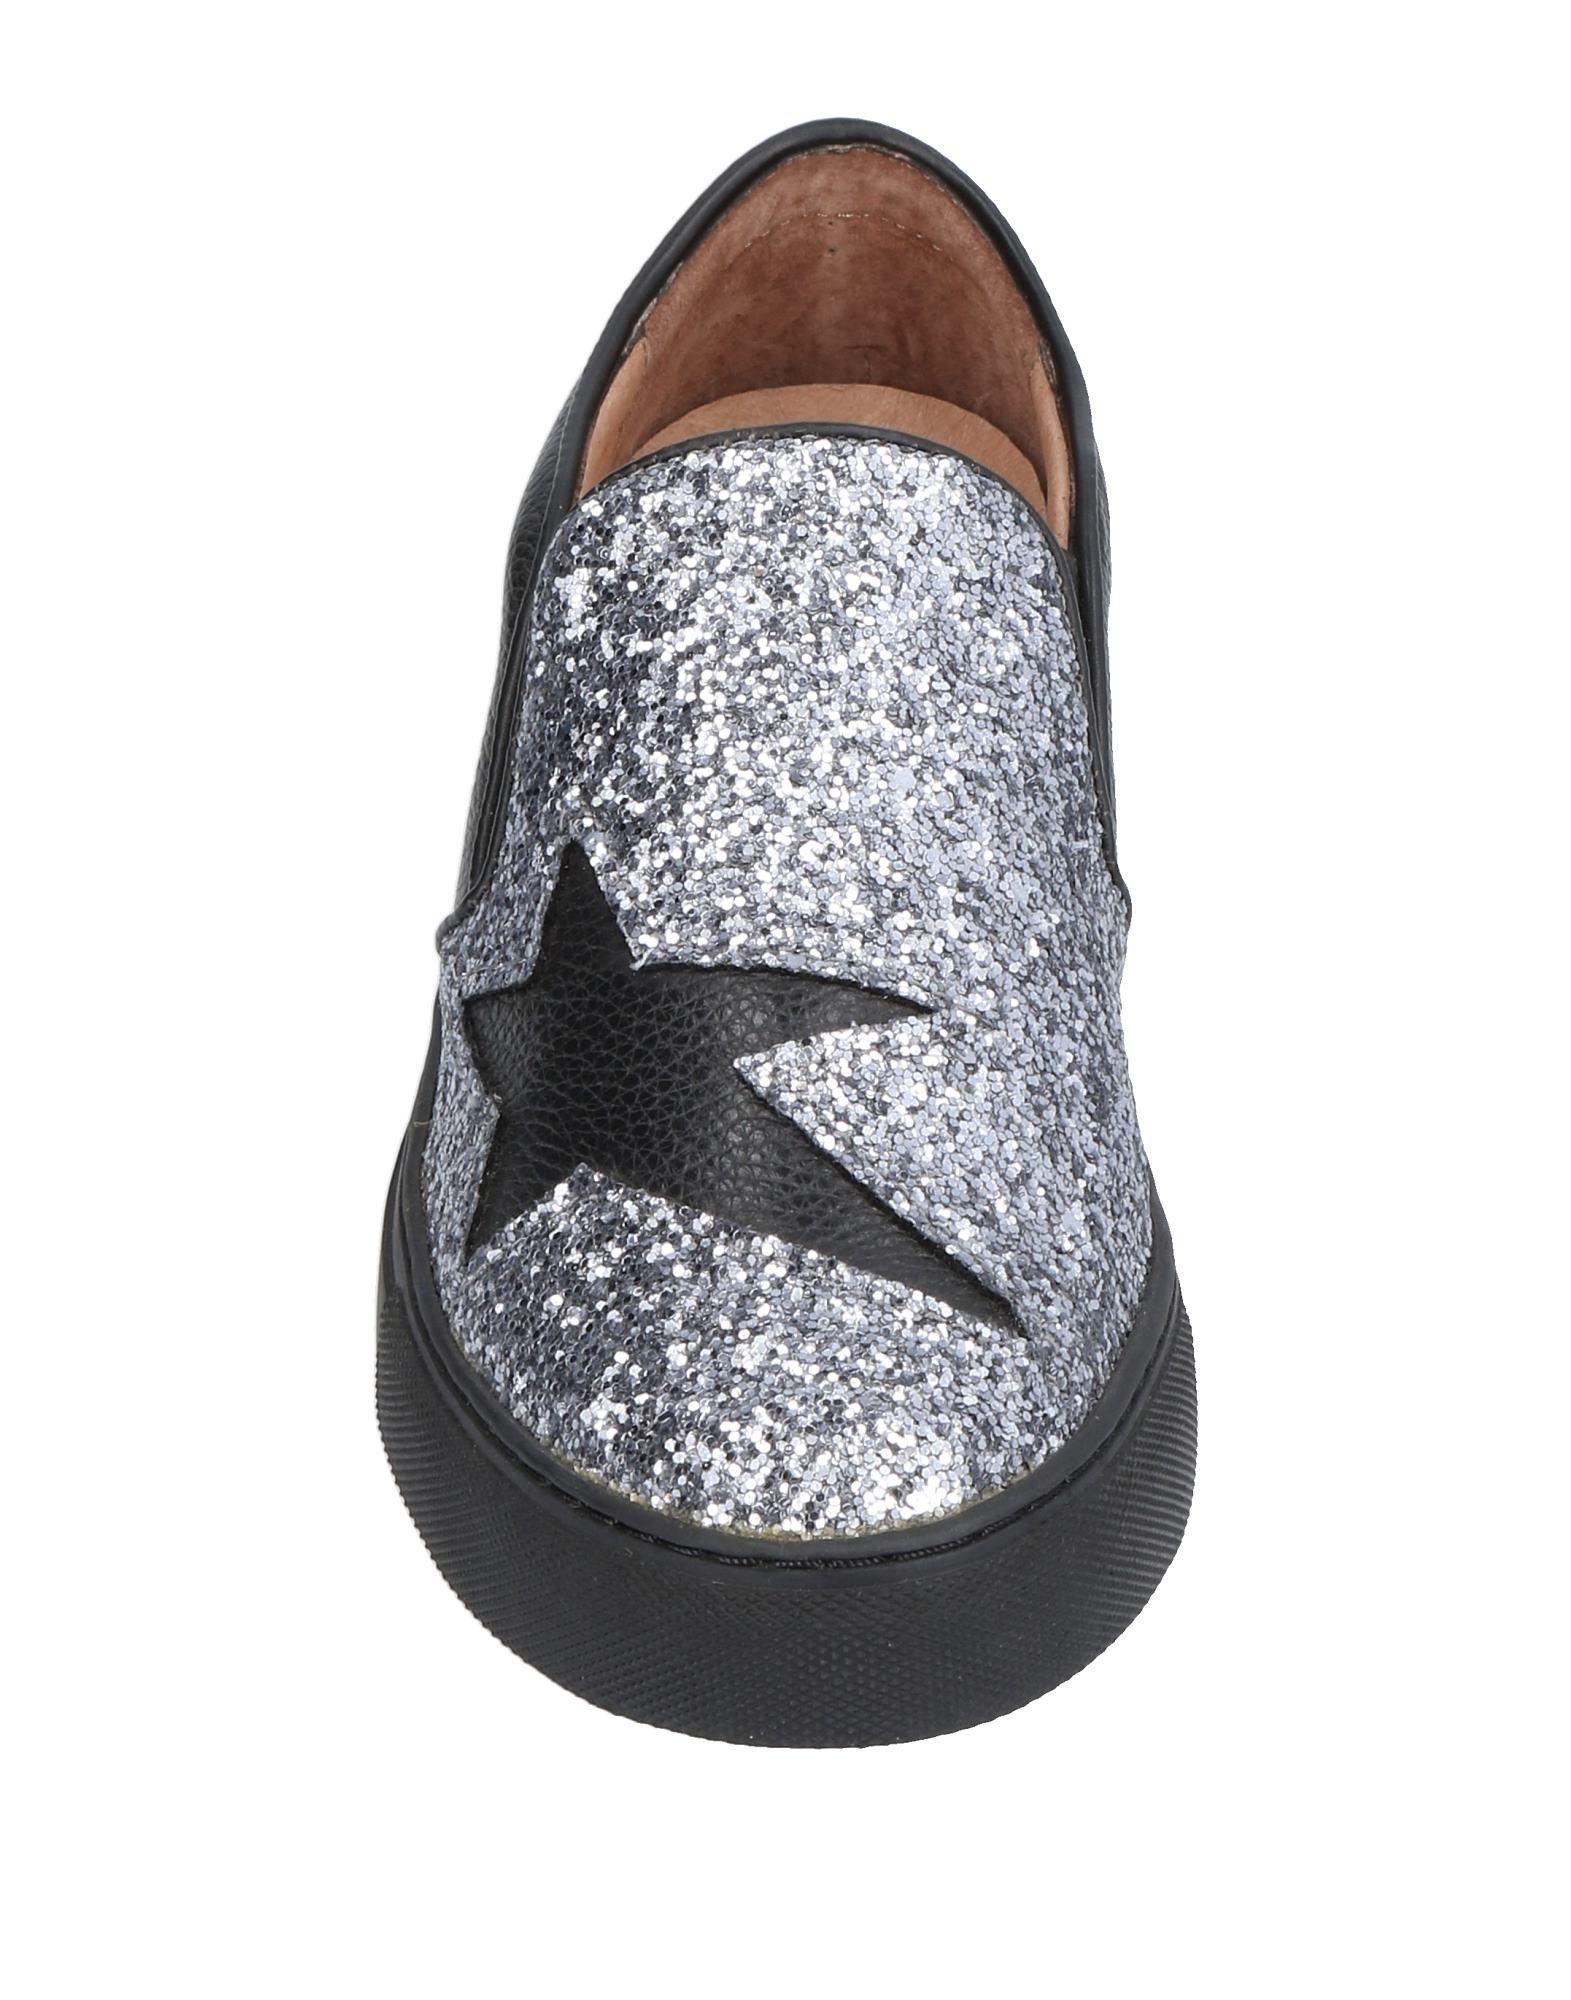 Roberto Della Croce Gute Sneakers Damen  11456032EH Gute Croce Qualität beliebte Schuhe 99c8b4